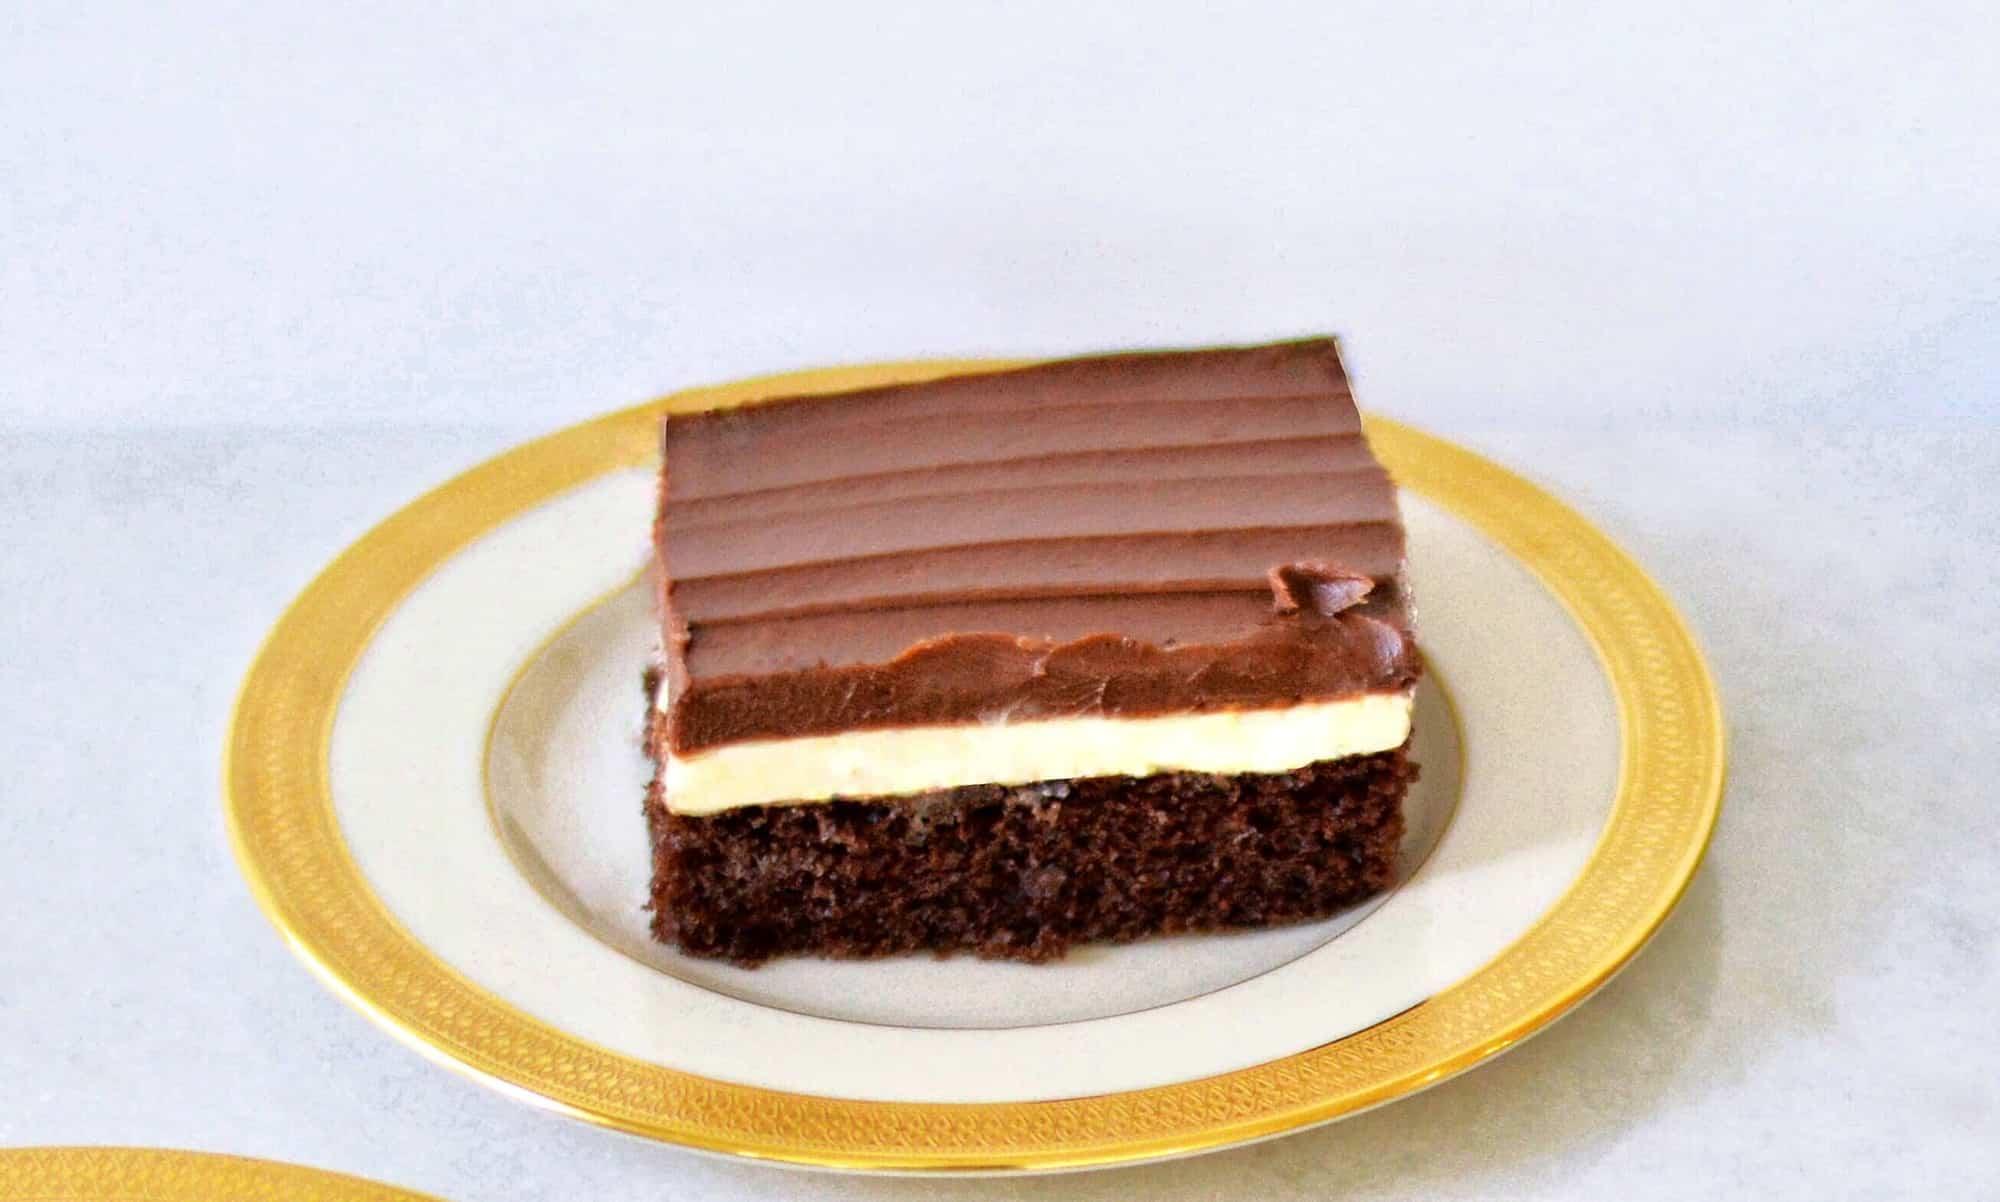 slice of Ho Ho cake: chocolate cake with layer of cream and ganache